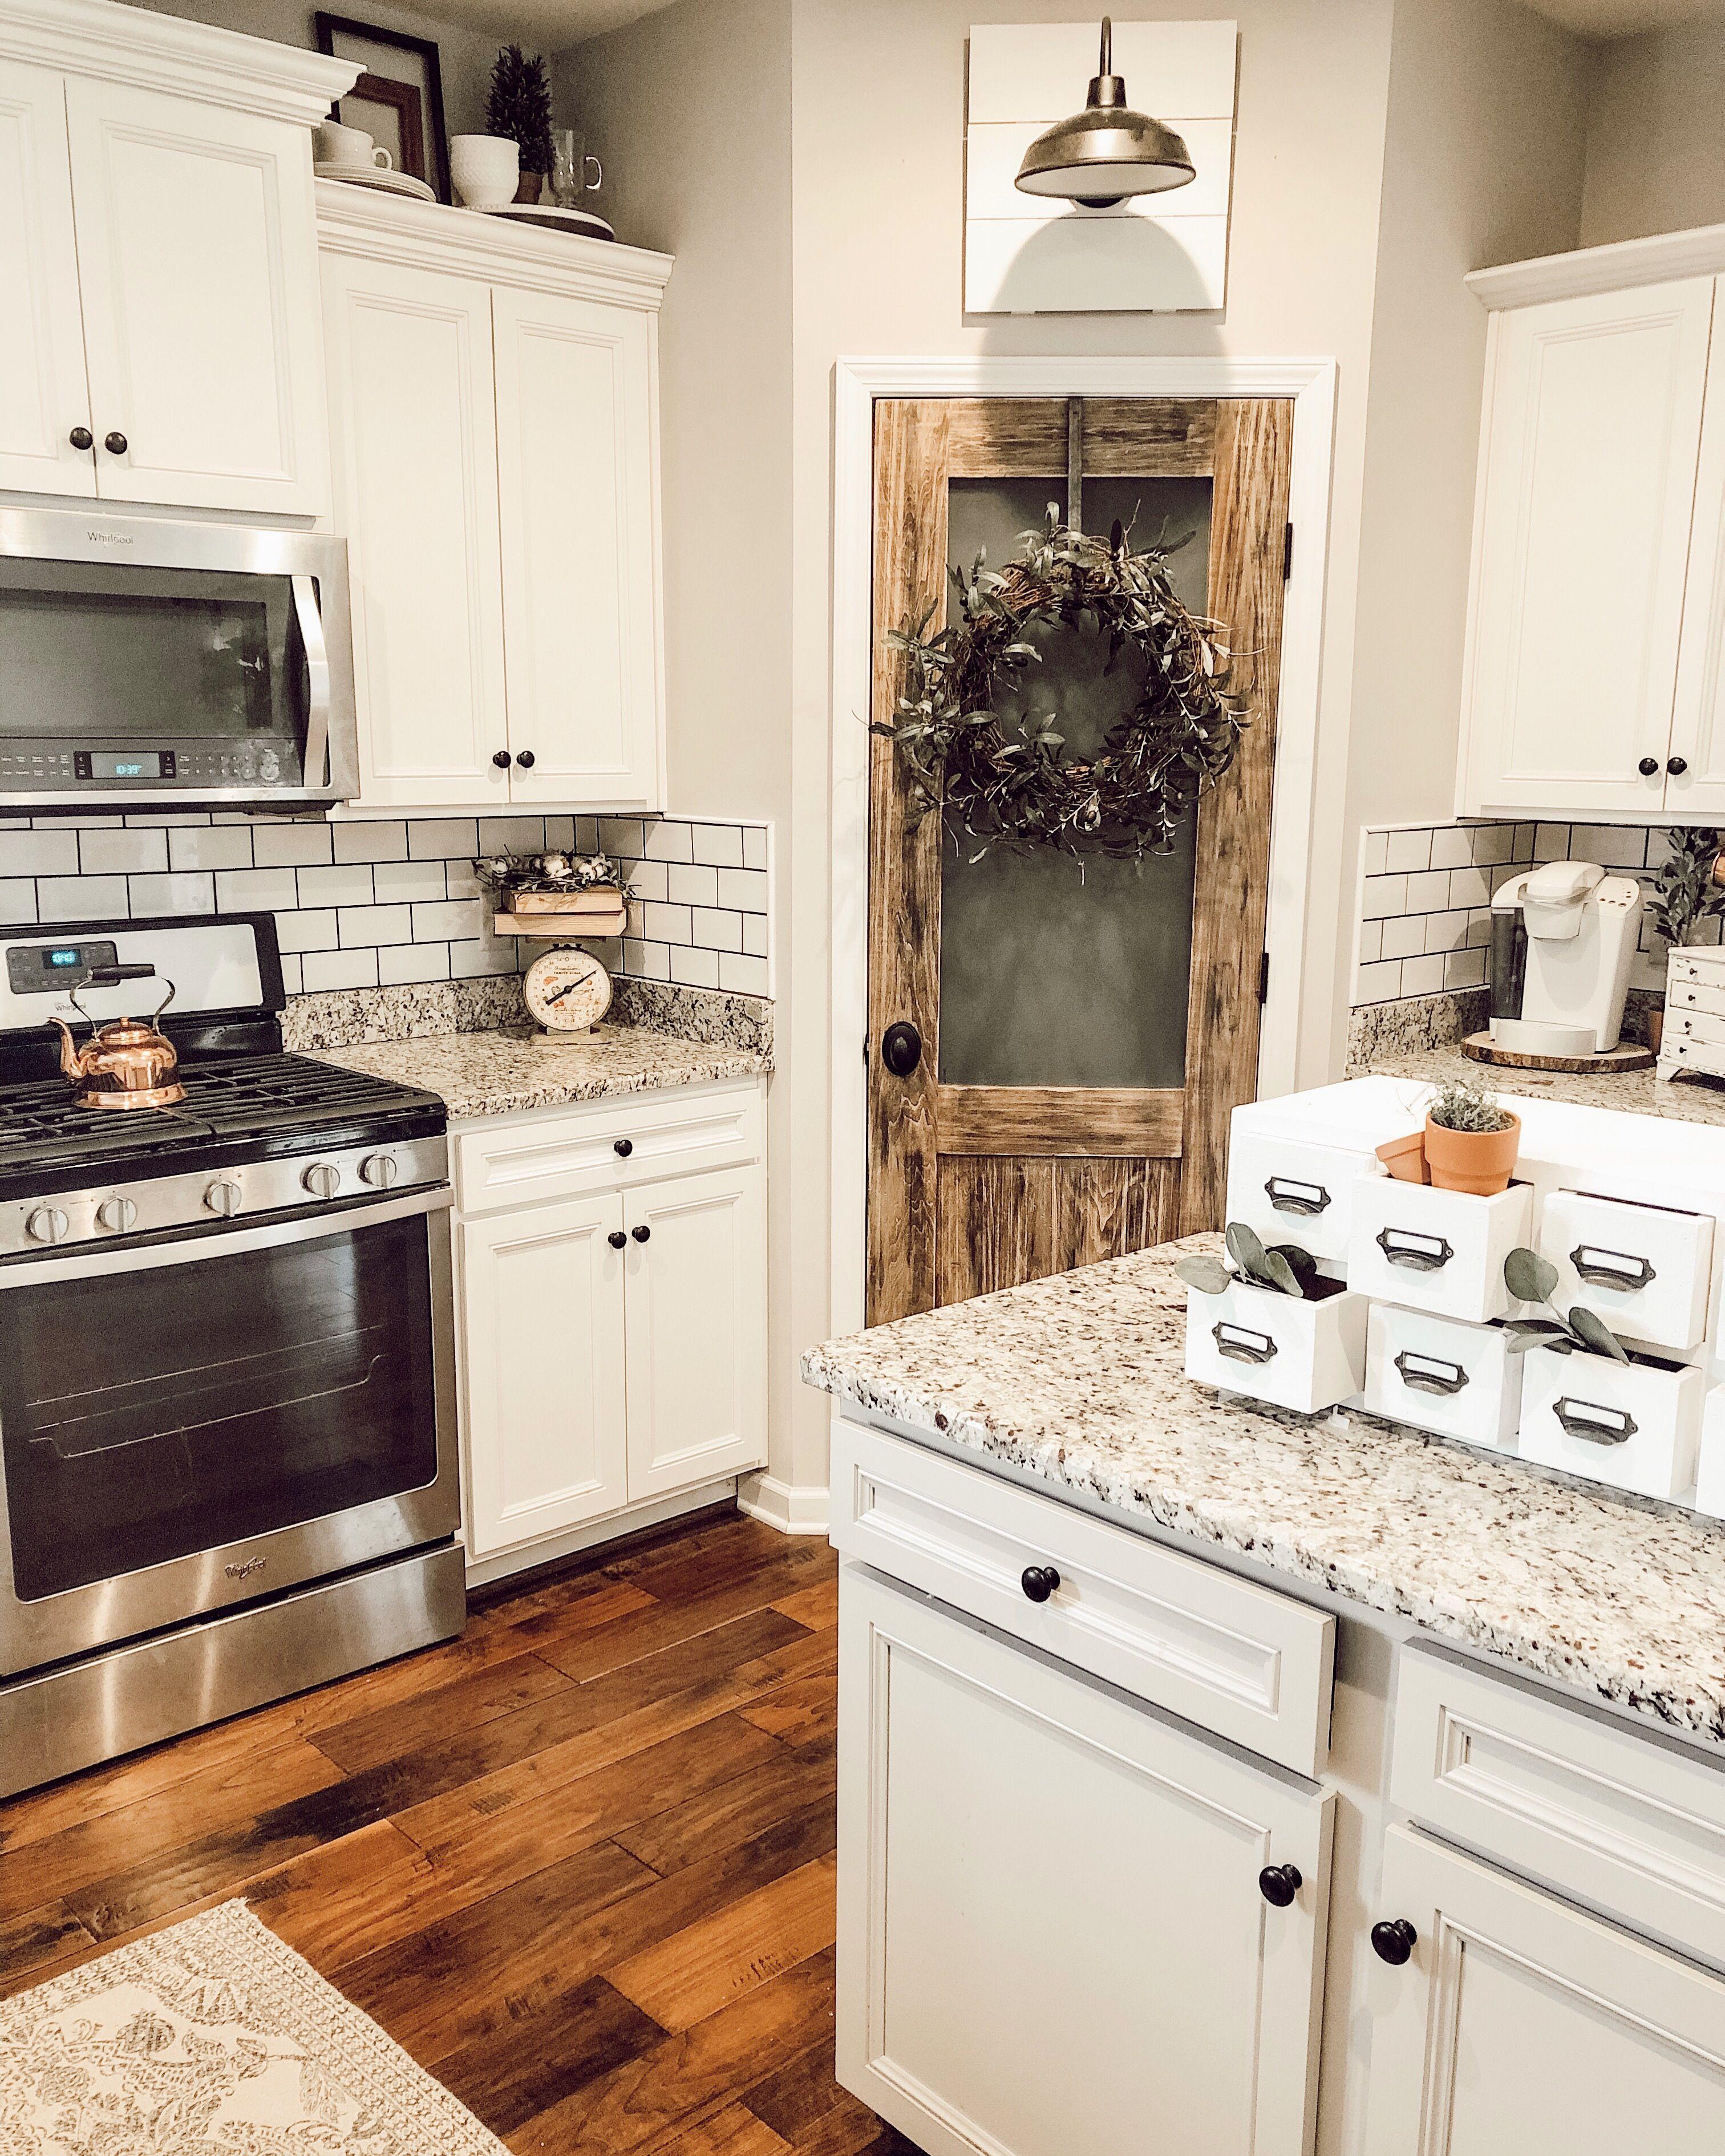 Create Your Own Kitchen Design